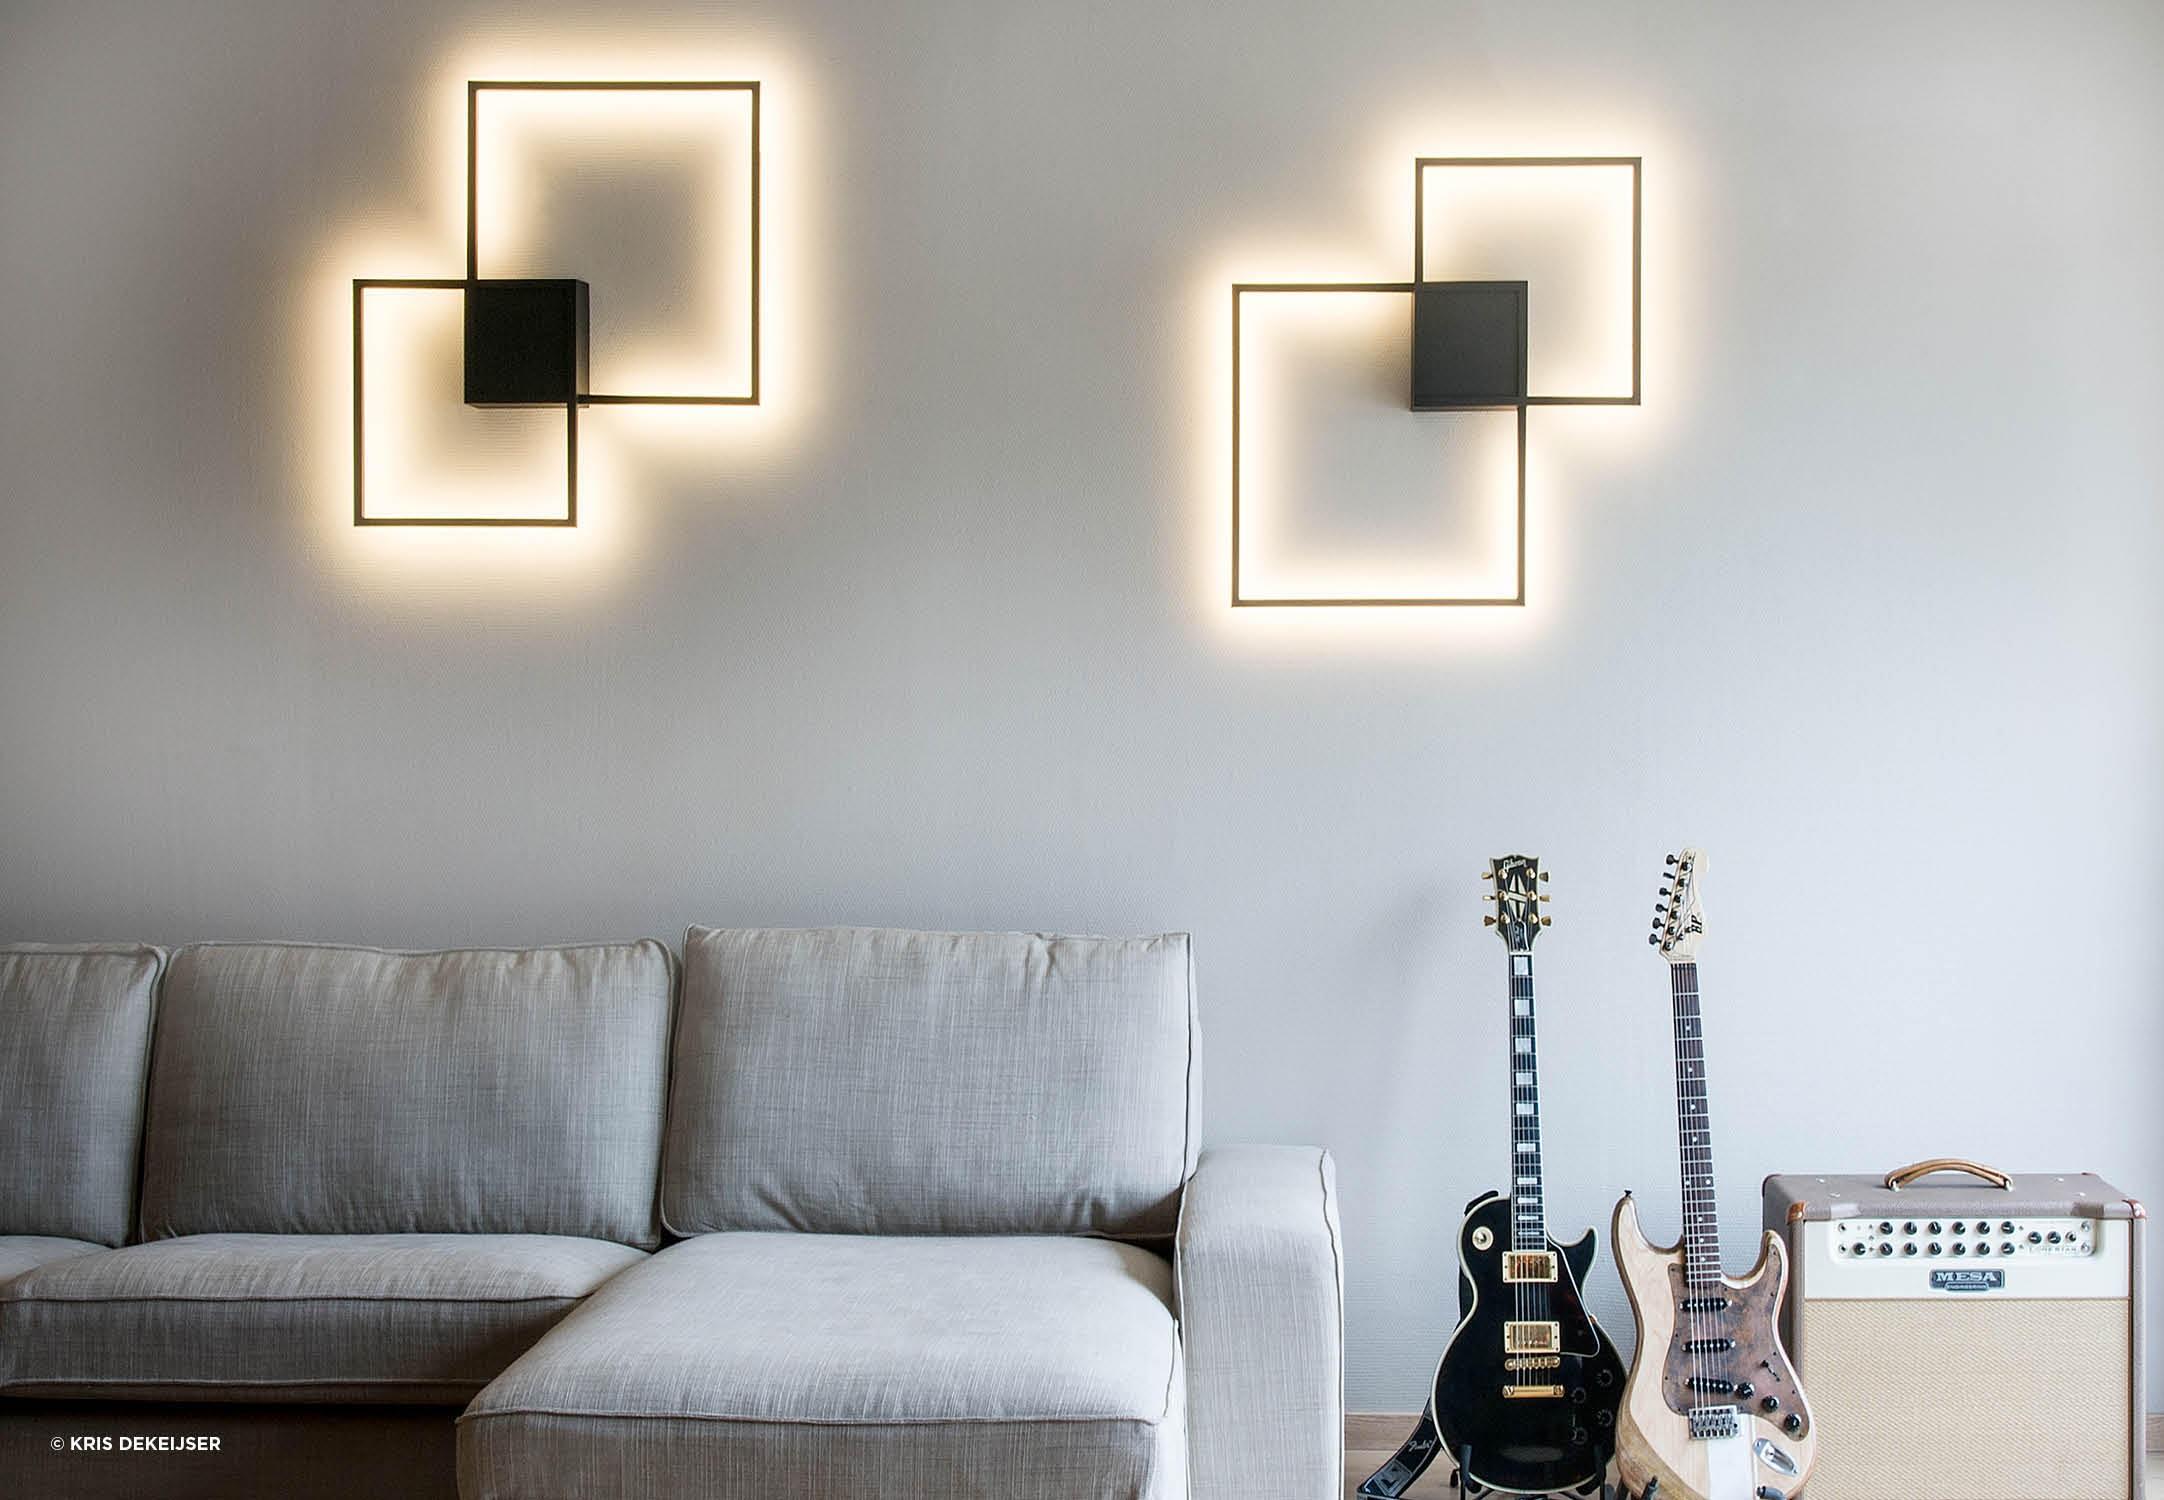 venn de wever ducr minusines. Black Bedroom Furniture Sets. Home Design Ideas